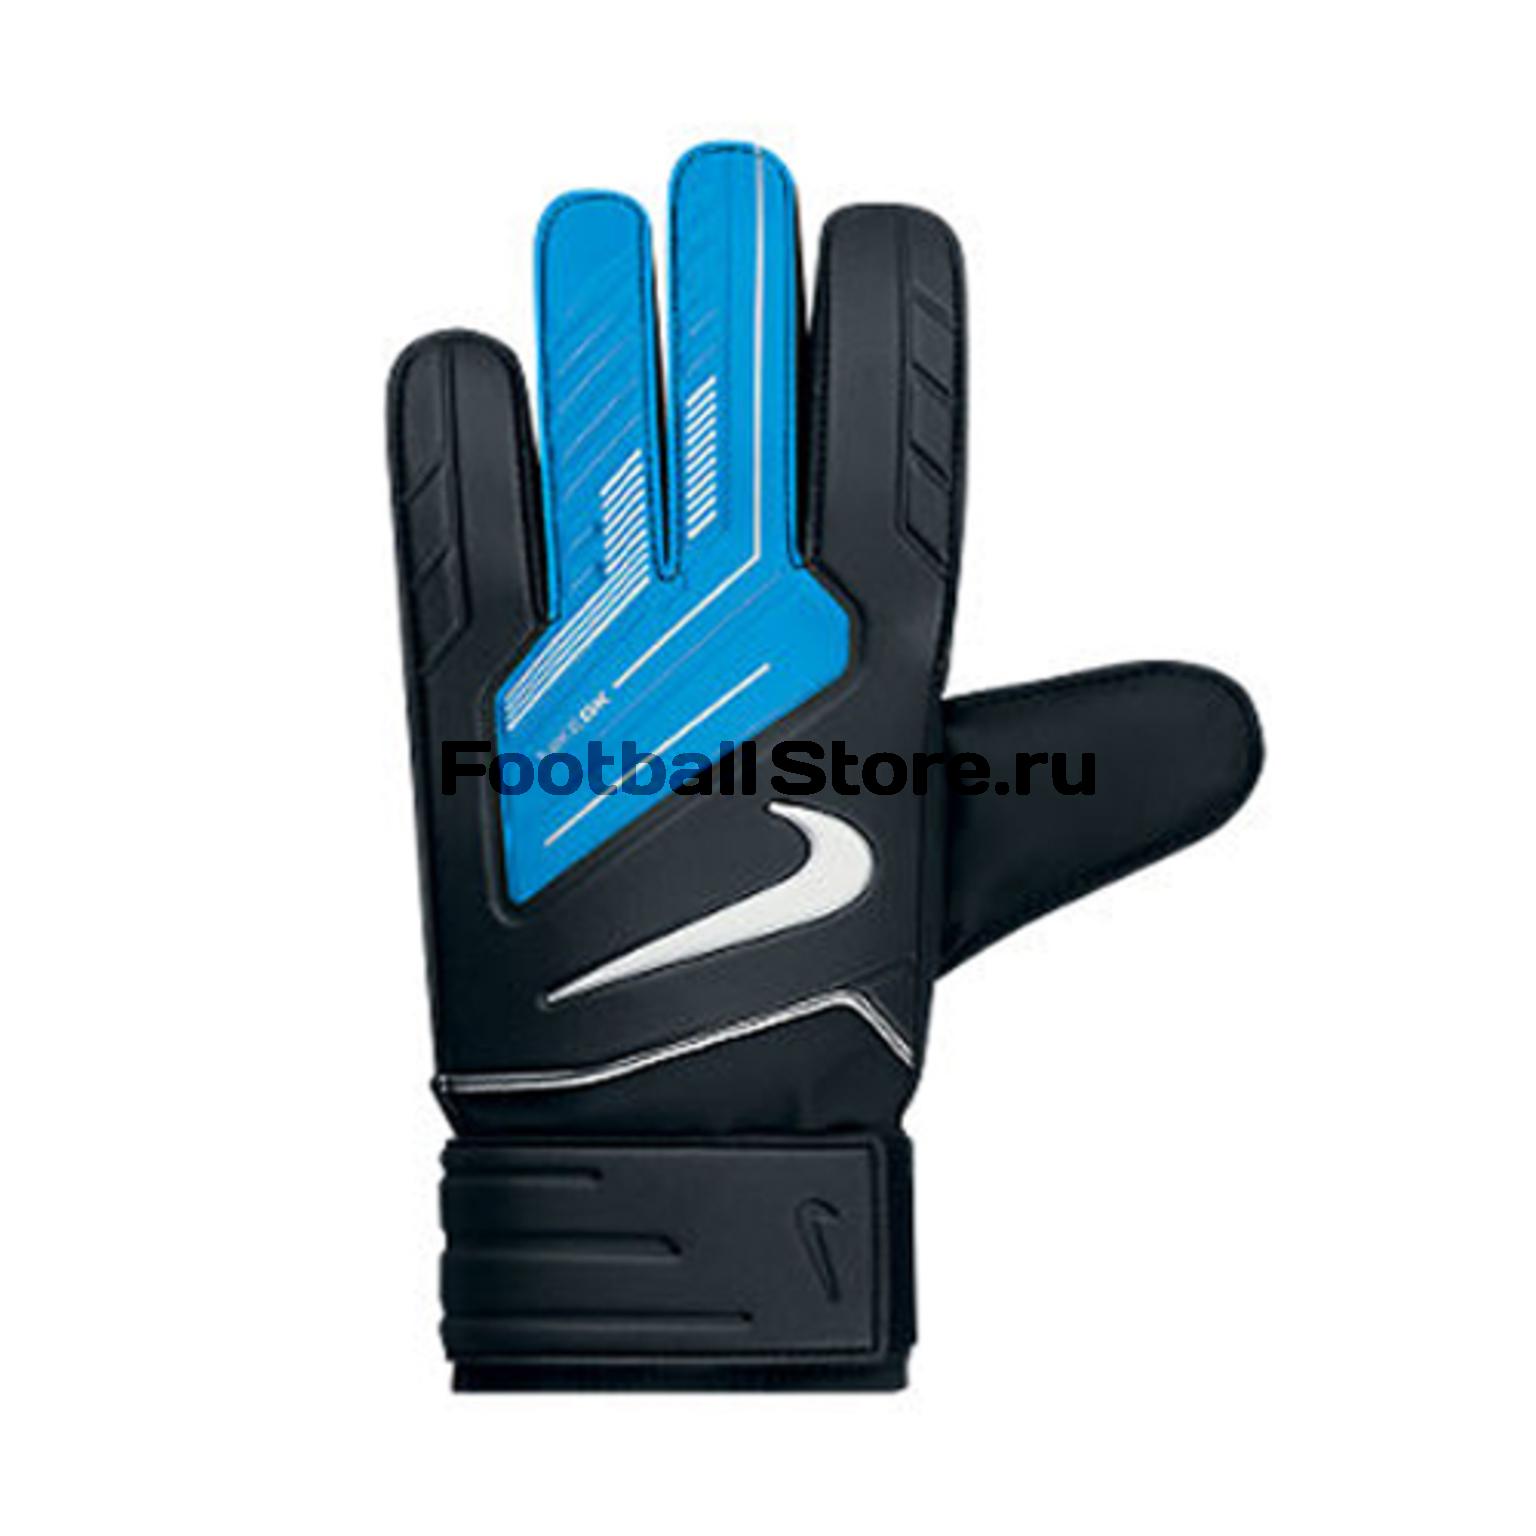 Перчатки Nike Вратарские перчатки Nike GK Match GS0258-041